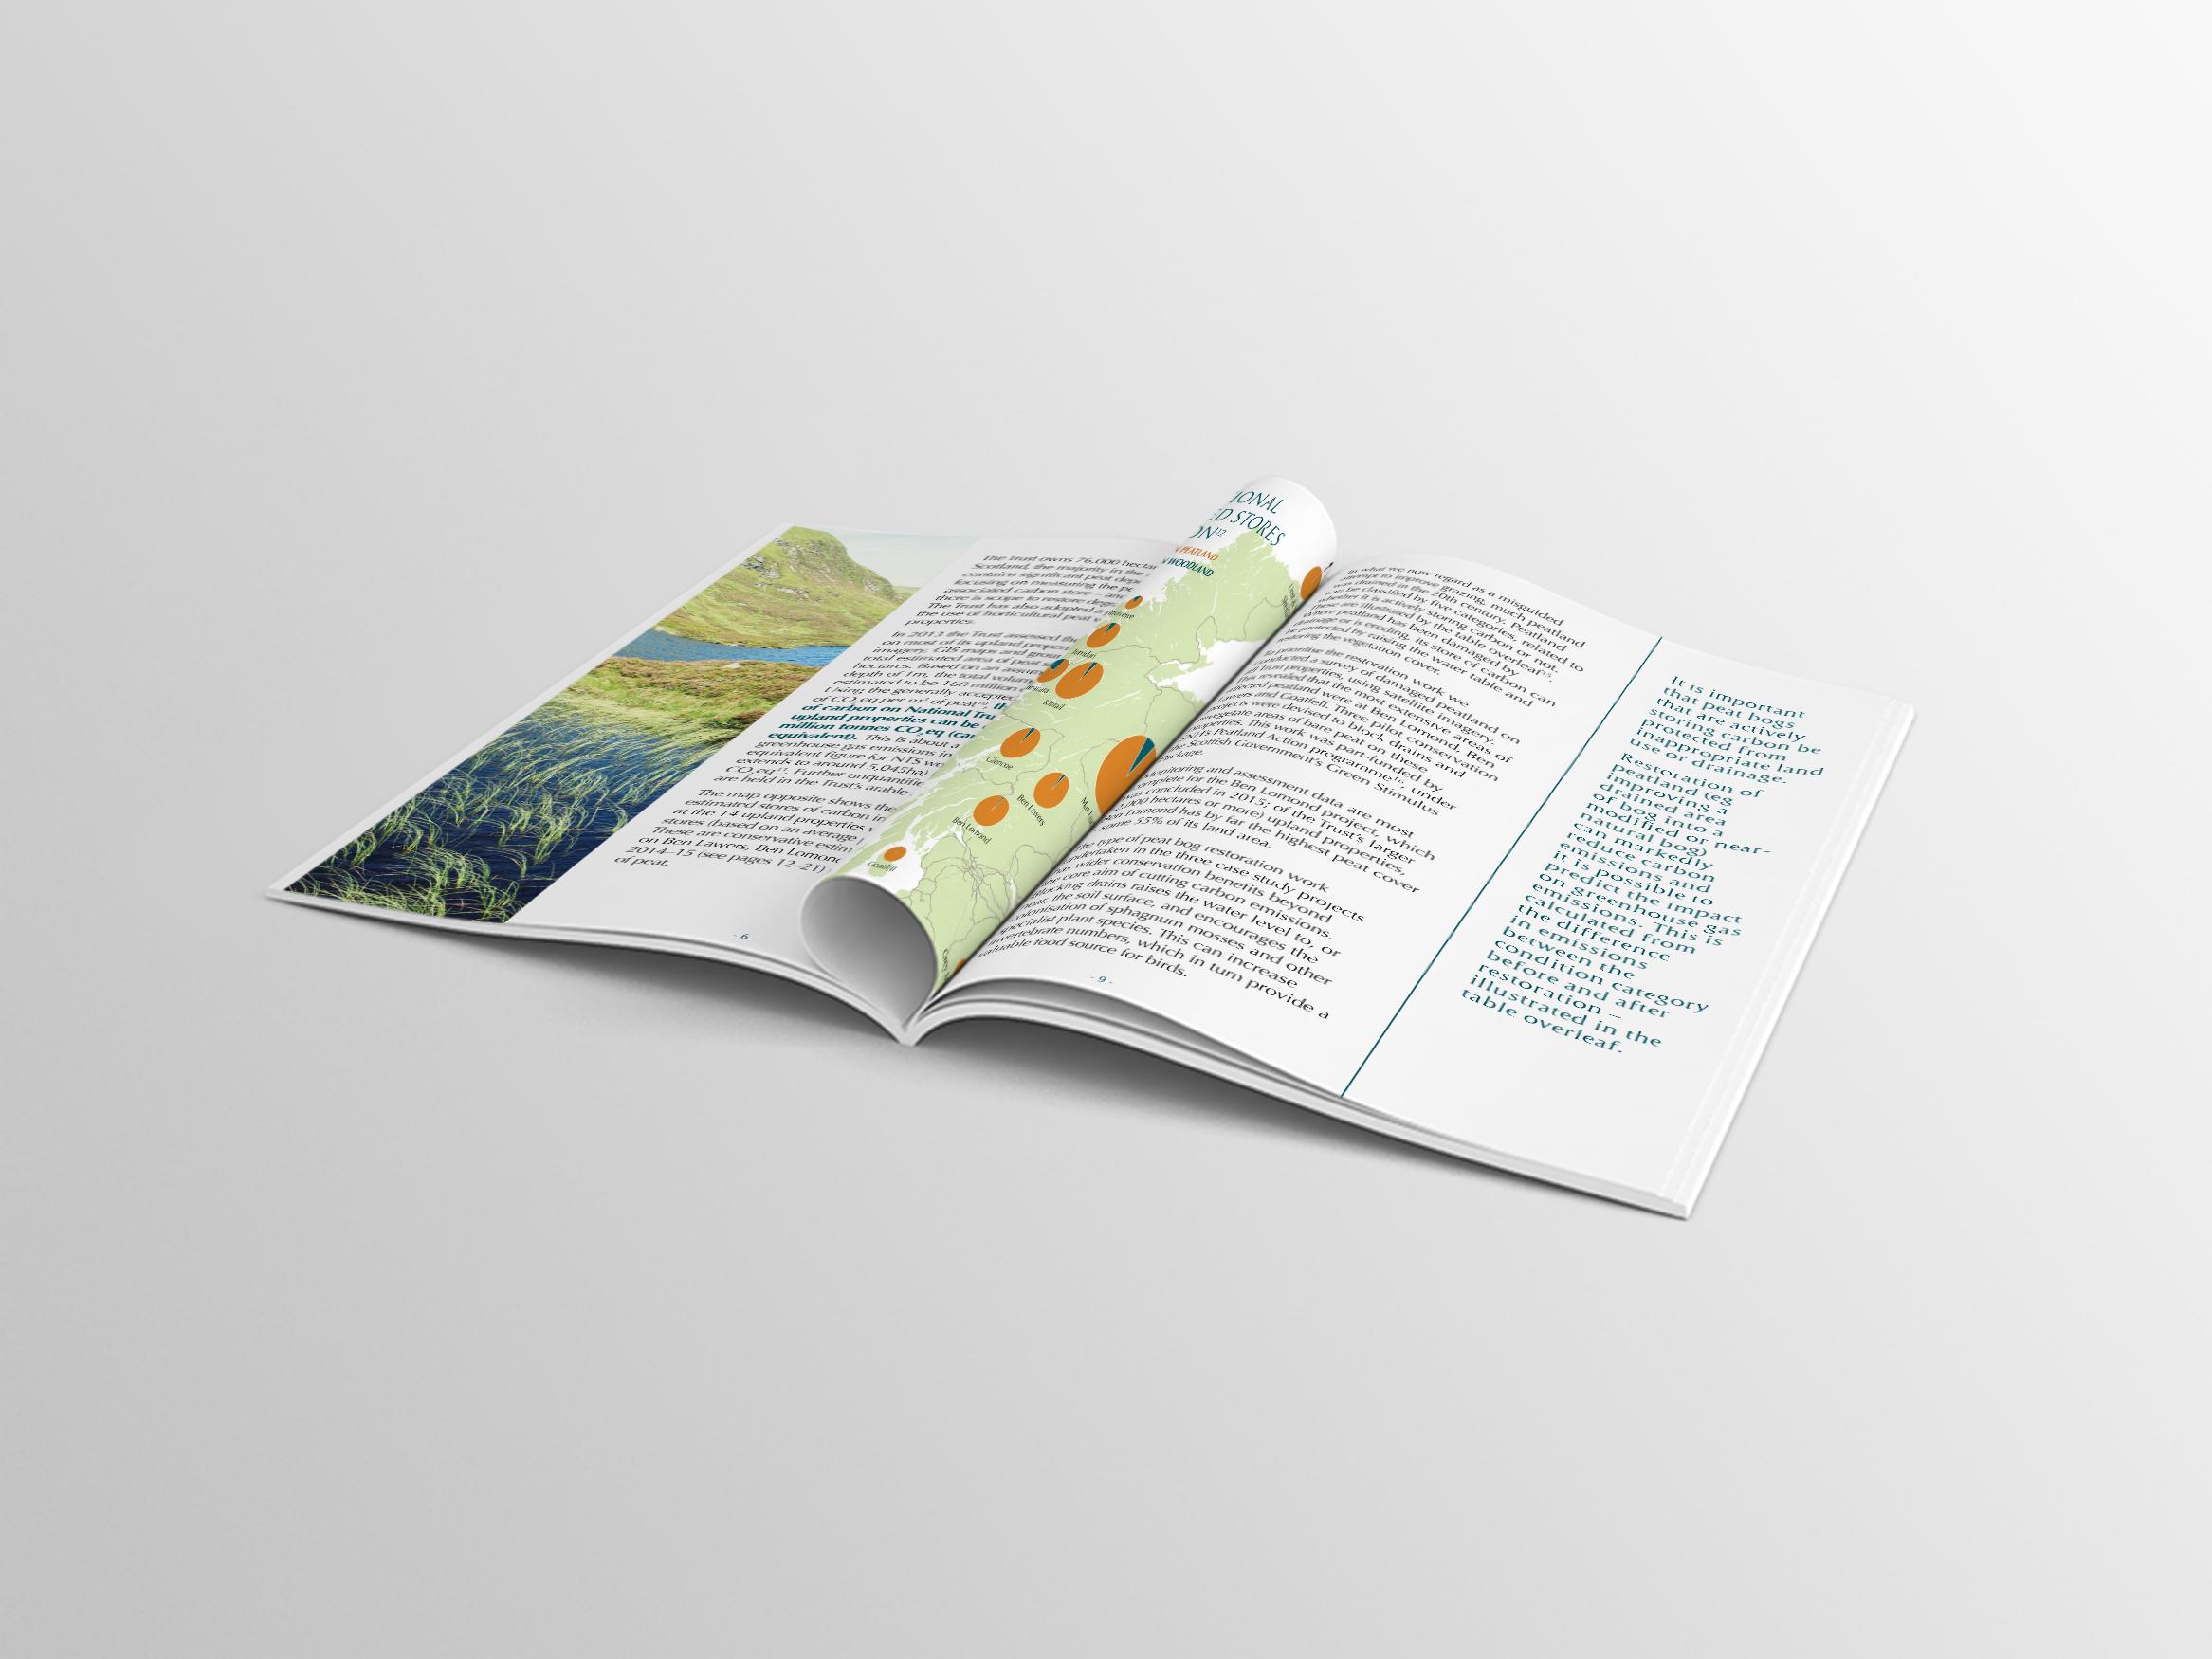 nts-publication-website19.jpg